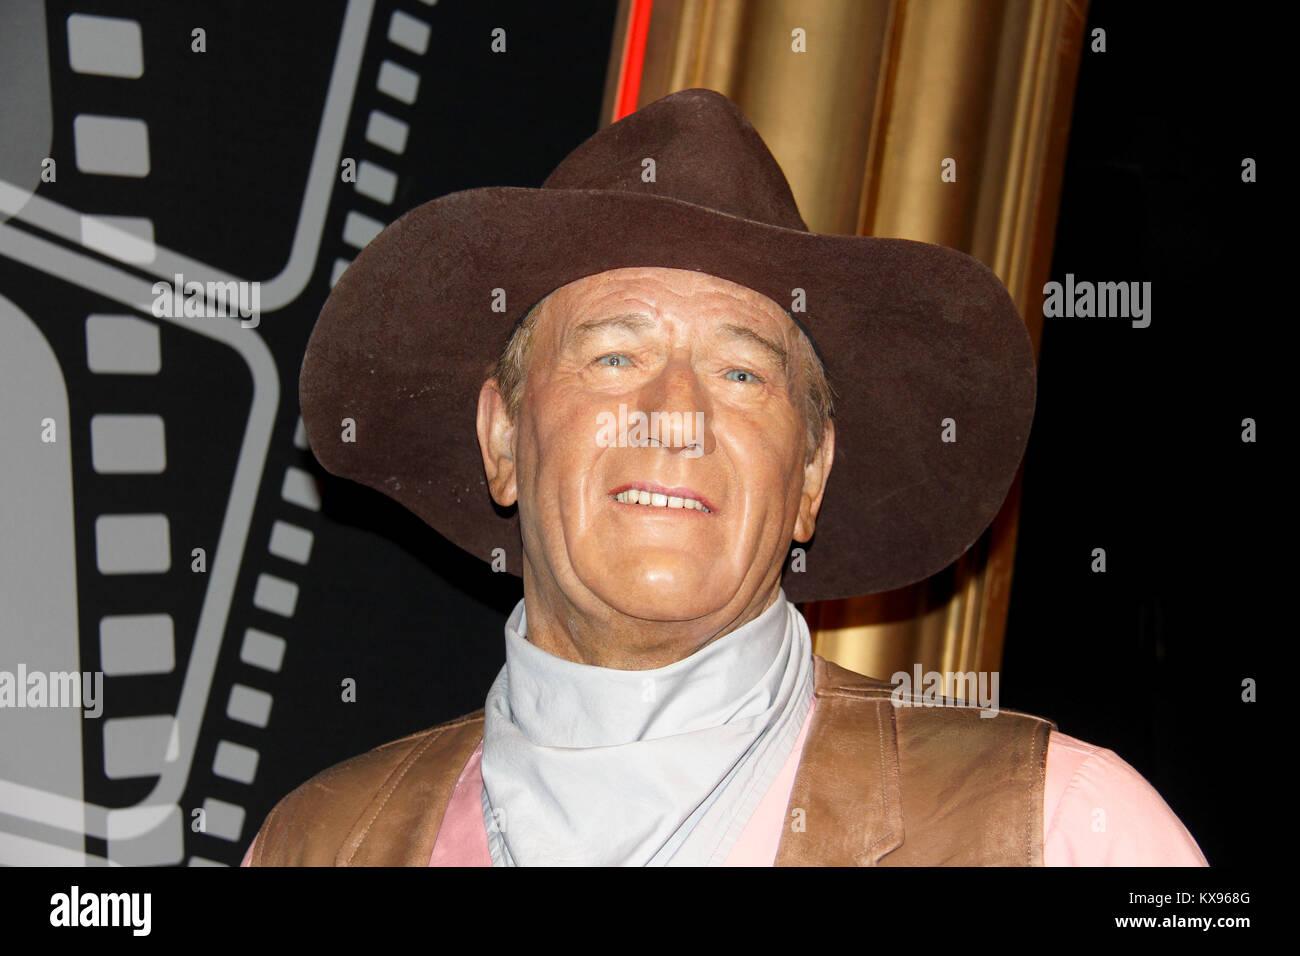 London, - United Kingdom, 08, July 2014. Madame Tussauds in London. Waxwork statue of John Wayne. - Stock Image